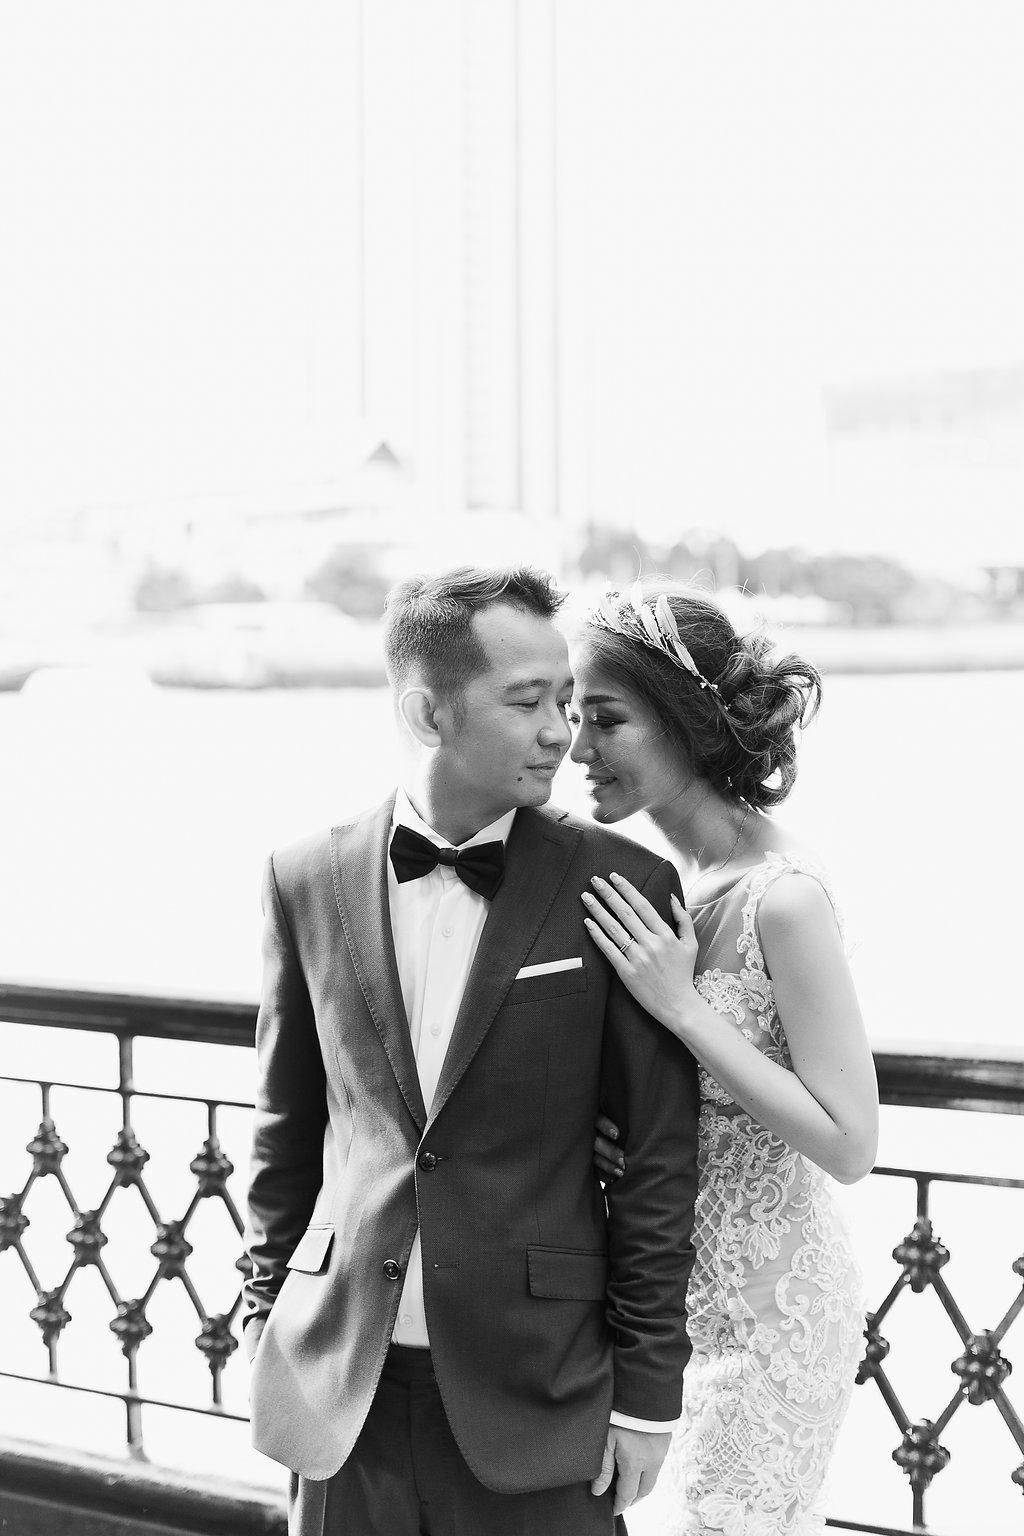 Luxe destination wedding in Jakarta and Bankok | fine art film wedding photographer Tanja Kibogo 5005.JPG